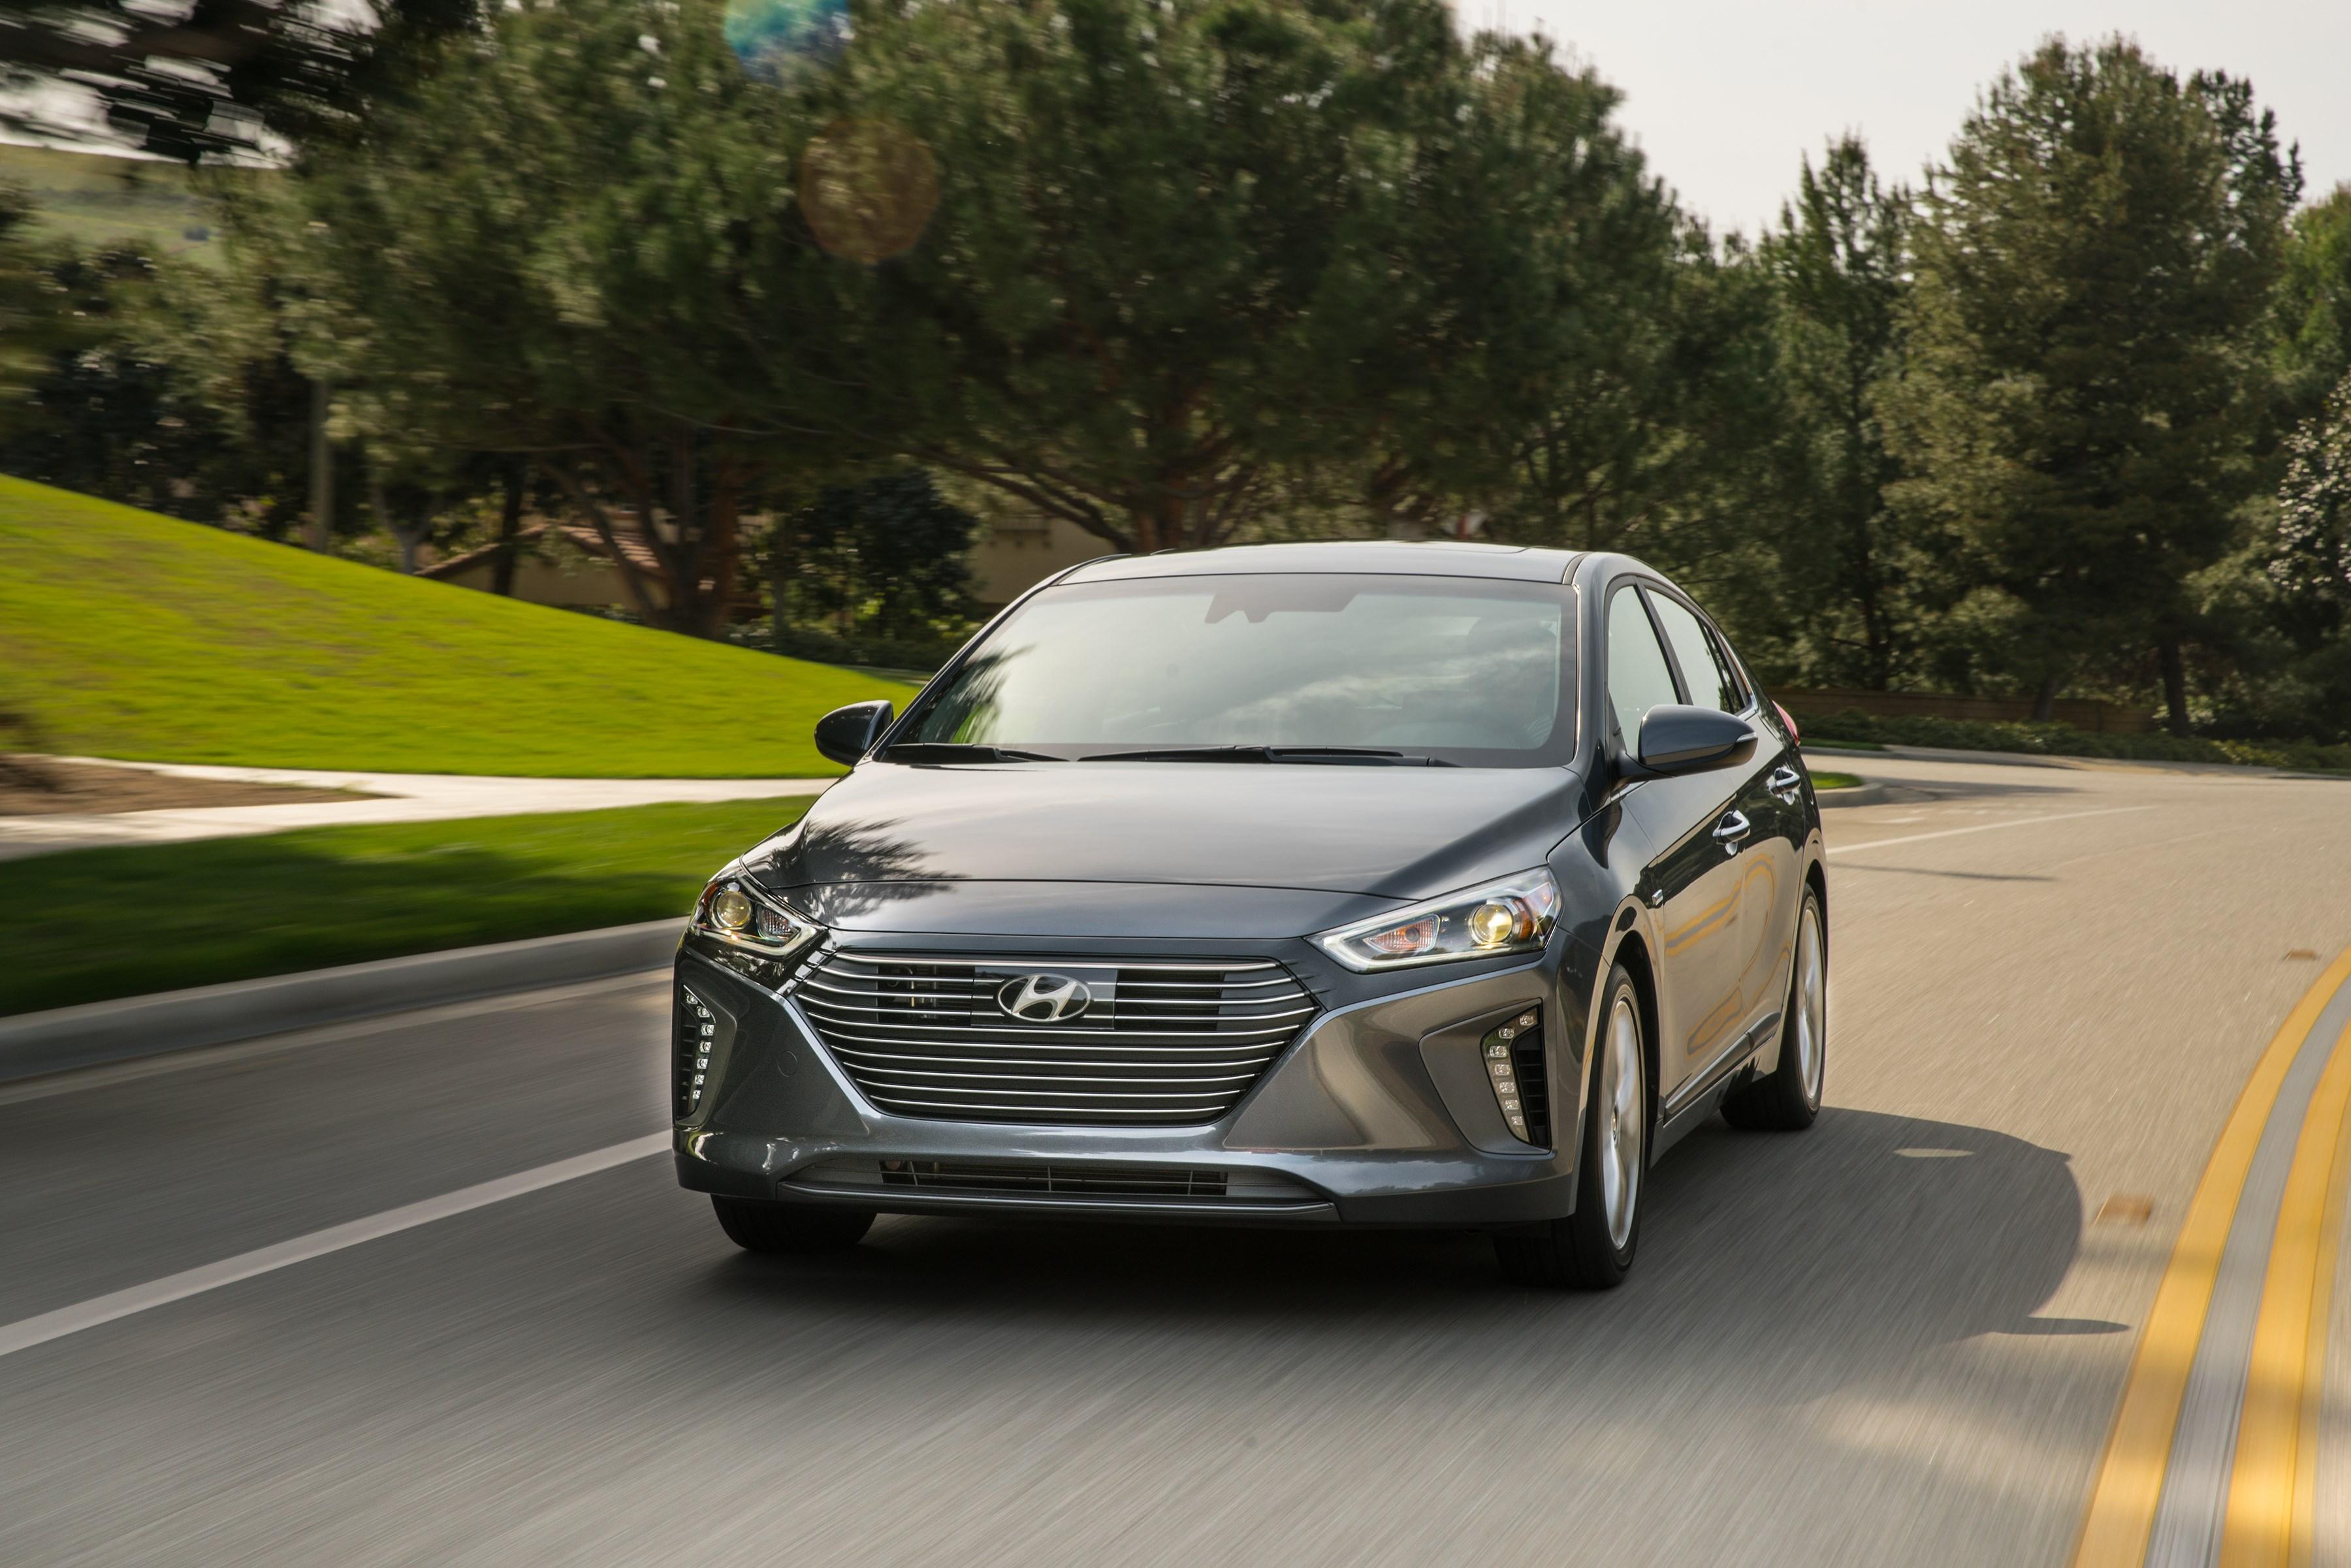 Hyundai's Electrified Ioniq Sedans